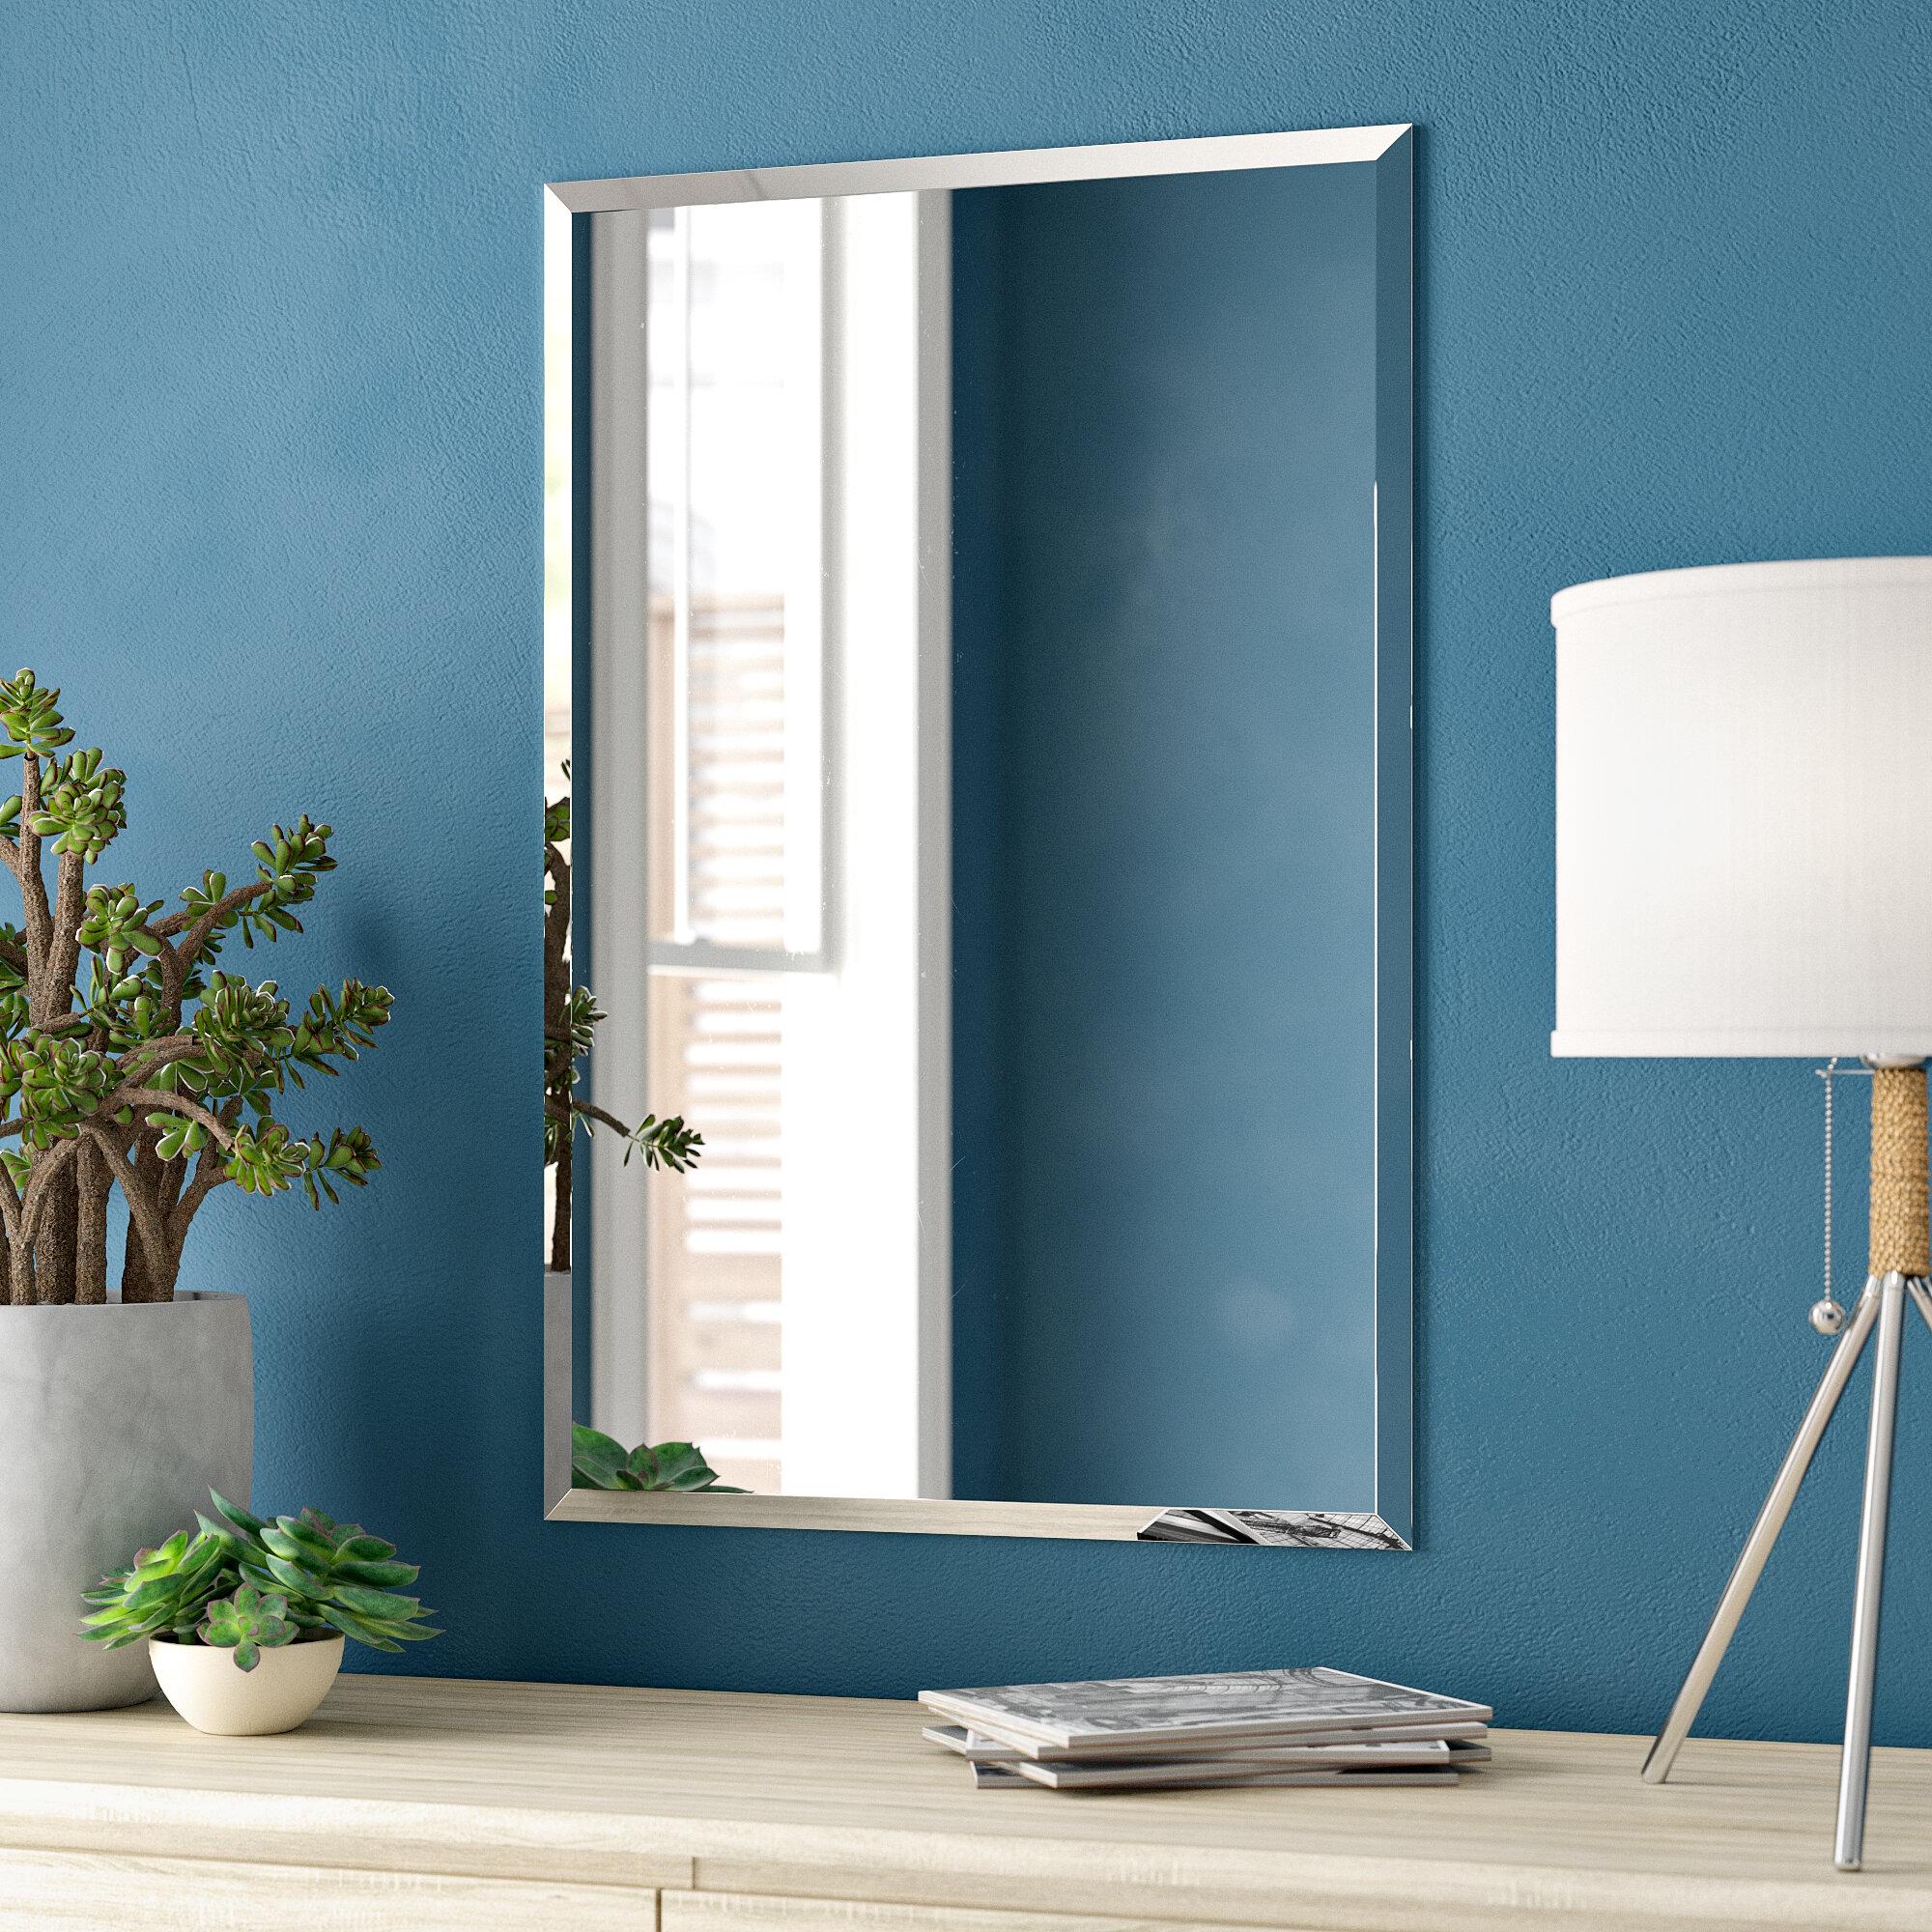 Zipcode Design Lithonia Modern And Contemporary Beveled Frameless Vanity Mirror Reviews Wayfair